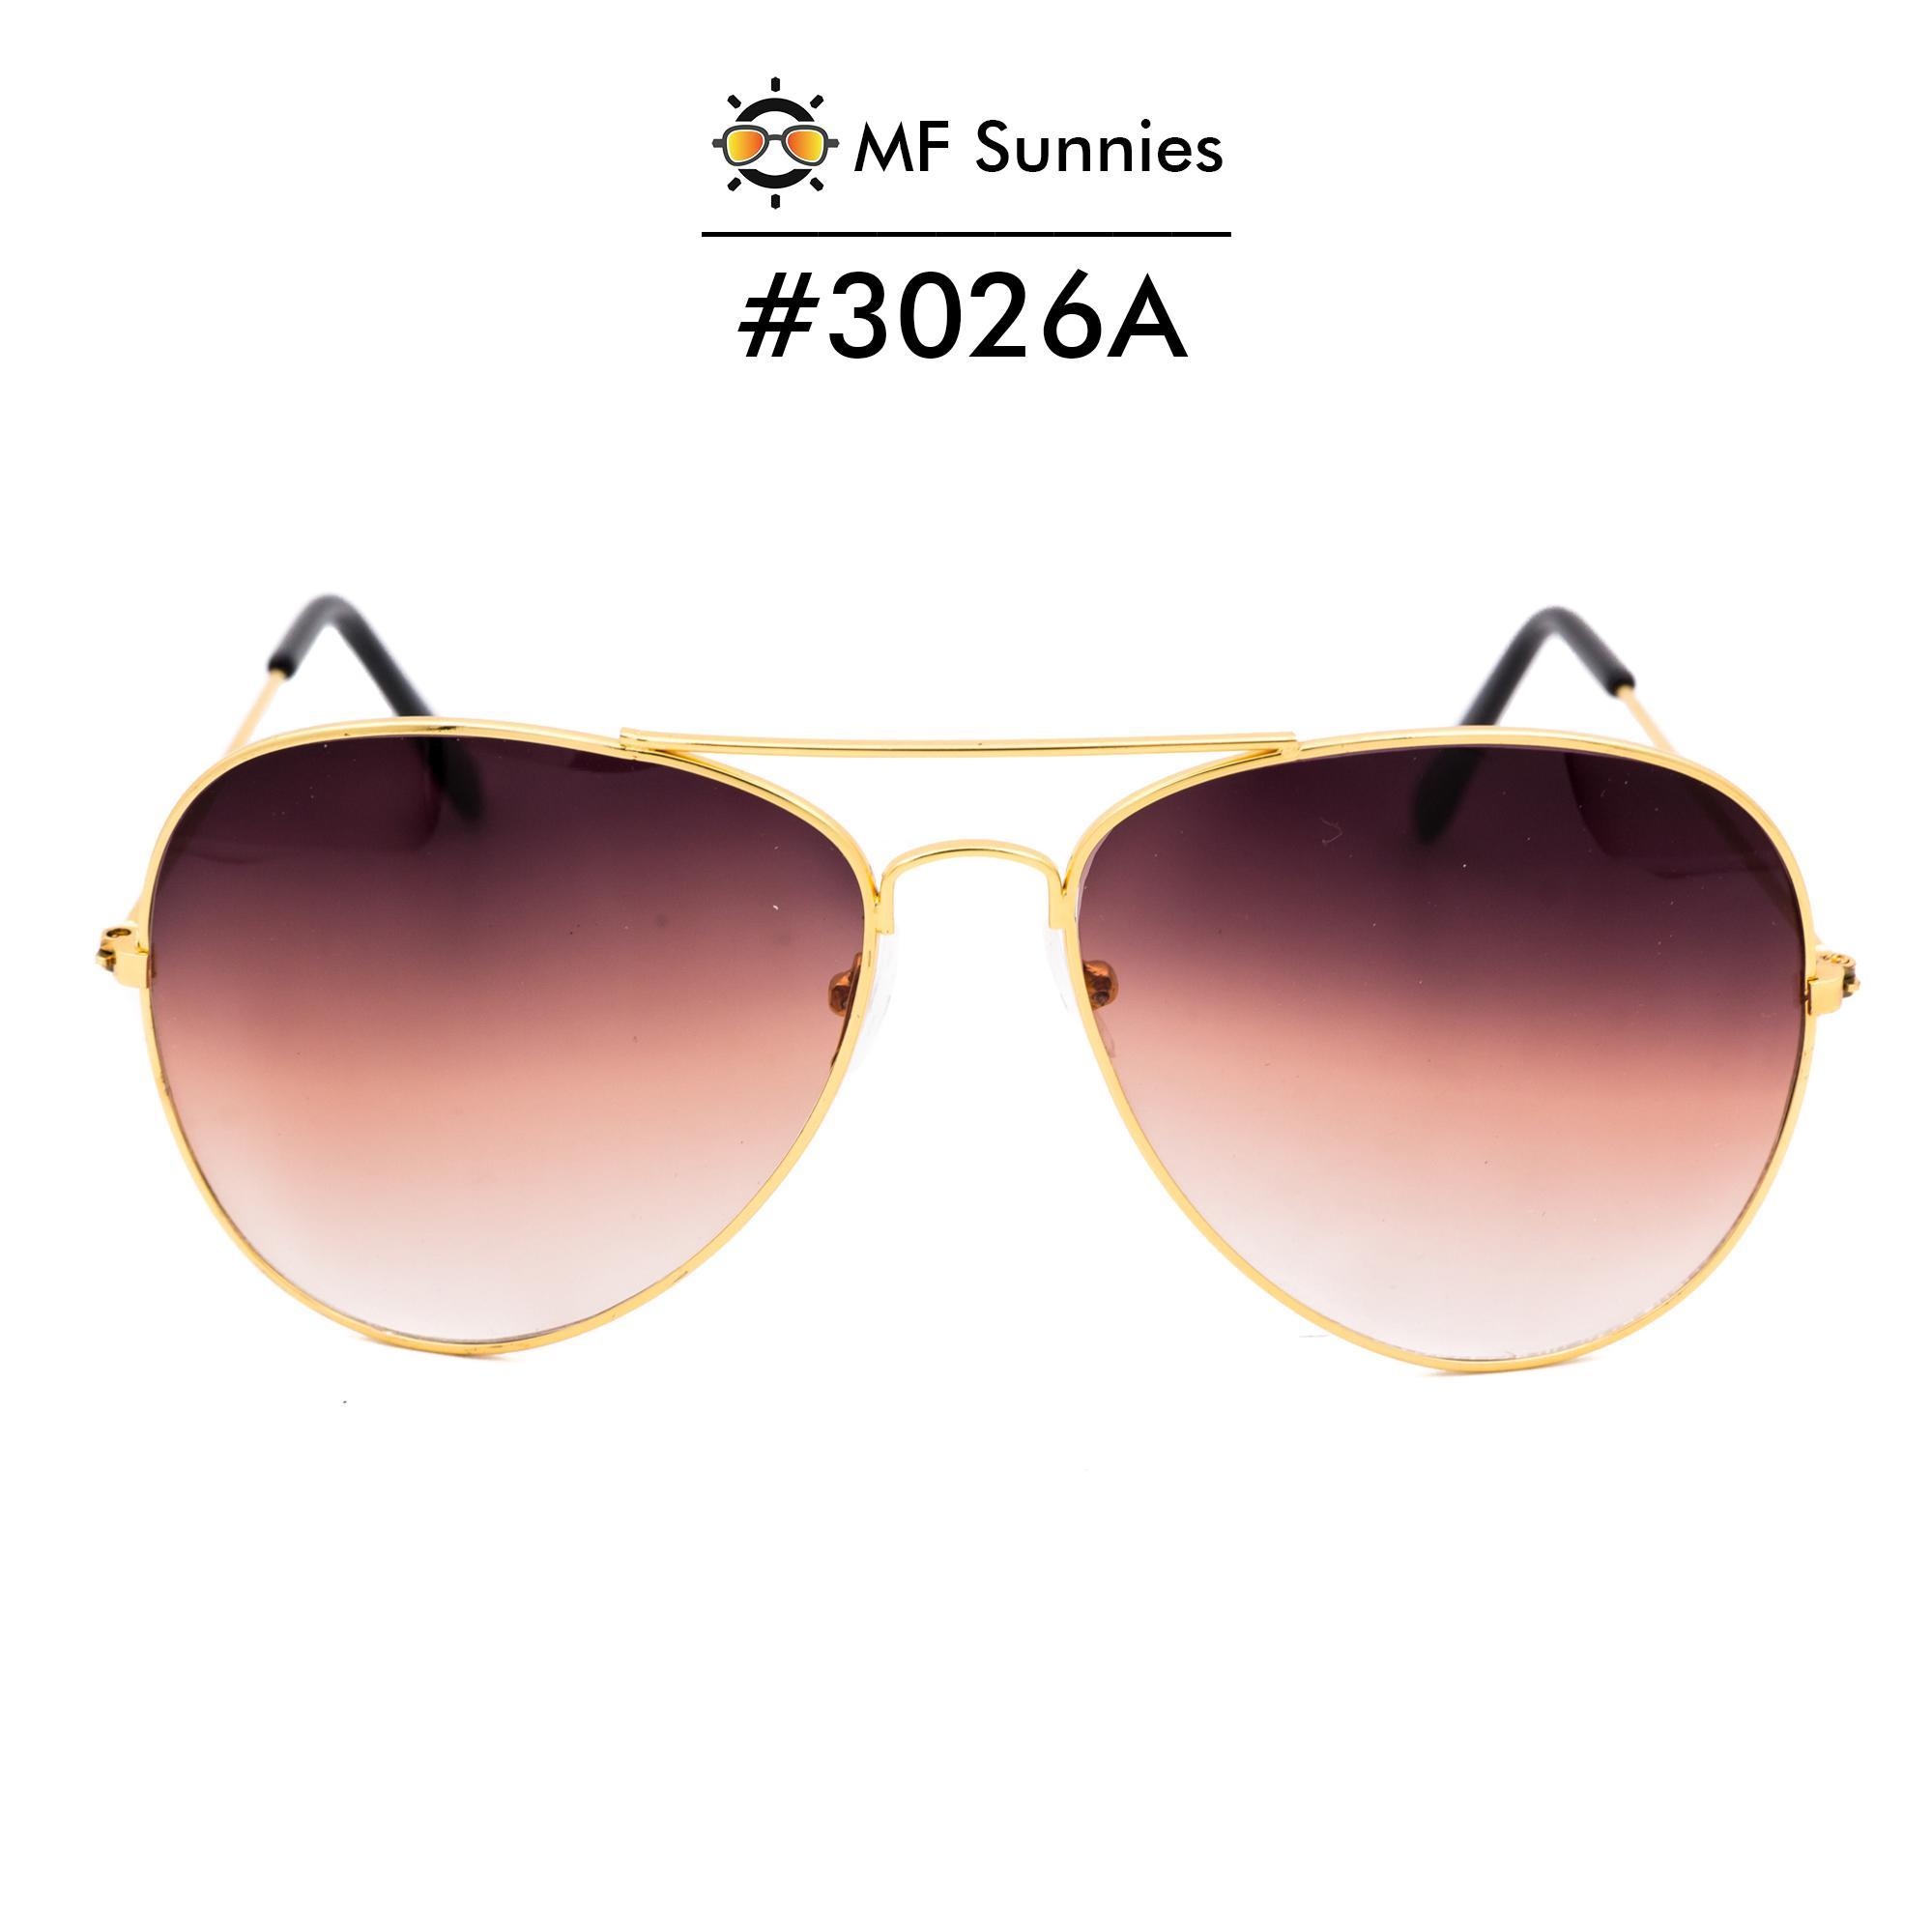 e781f48fa12 MFSunnies Sunnies Classic Aviator Gradient lens Metal Frame Fashion eyewear  Gradient Brown  3026A